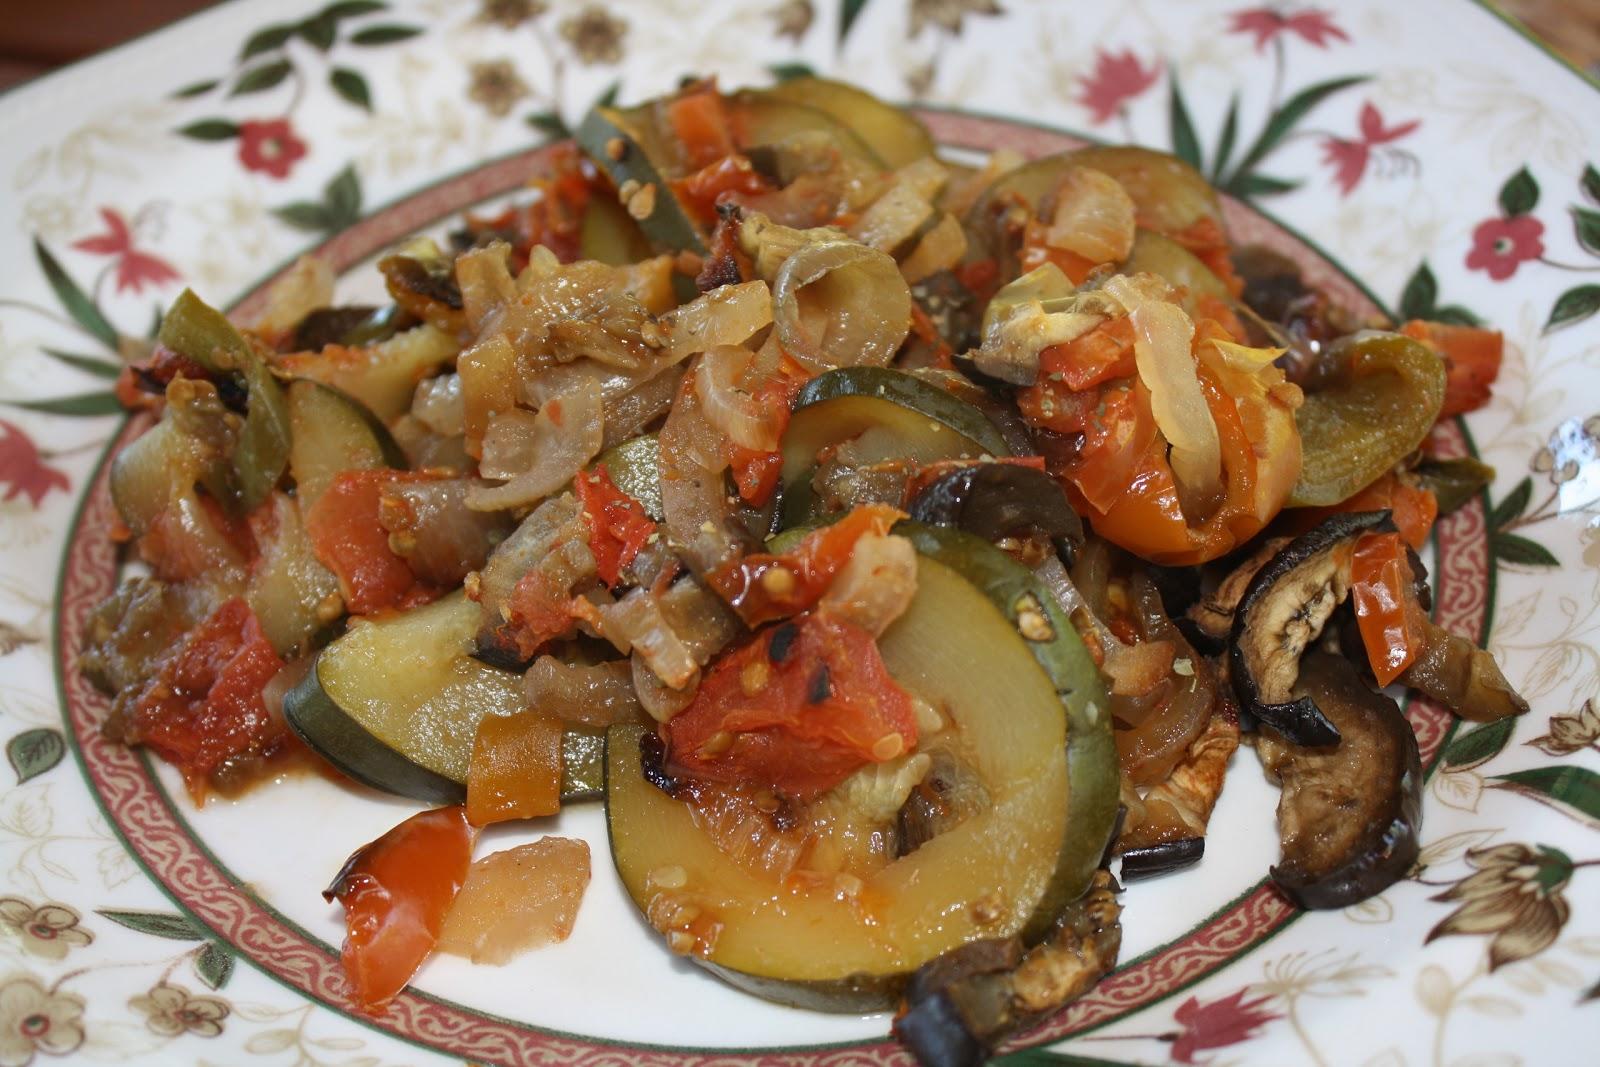 La dieta mediterr nea de nuestra familia verduras al - Cocinar verduras para dieta ...